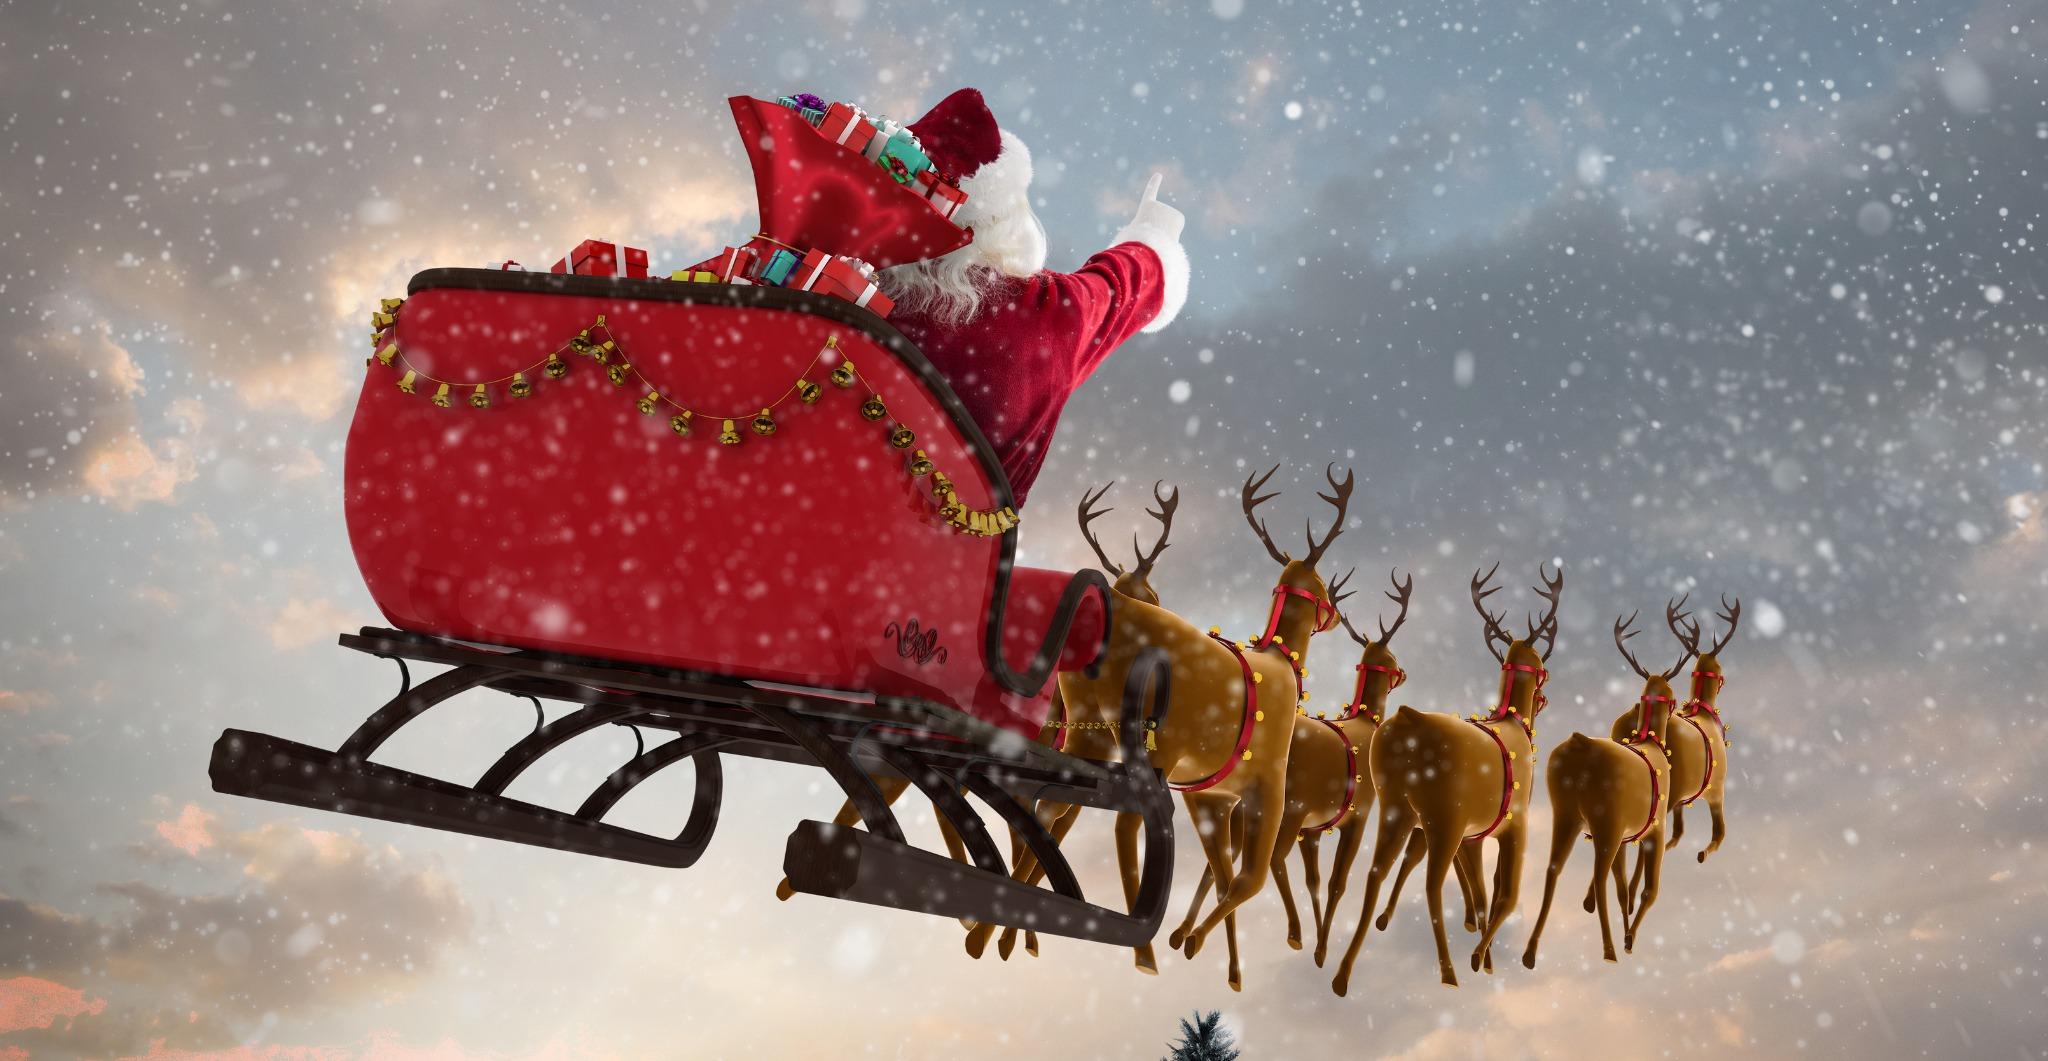 90 years Later: 'Flying Santa' of New England Still Drops ...